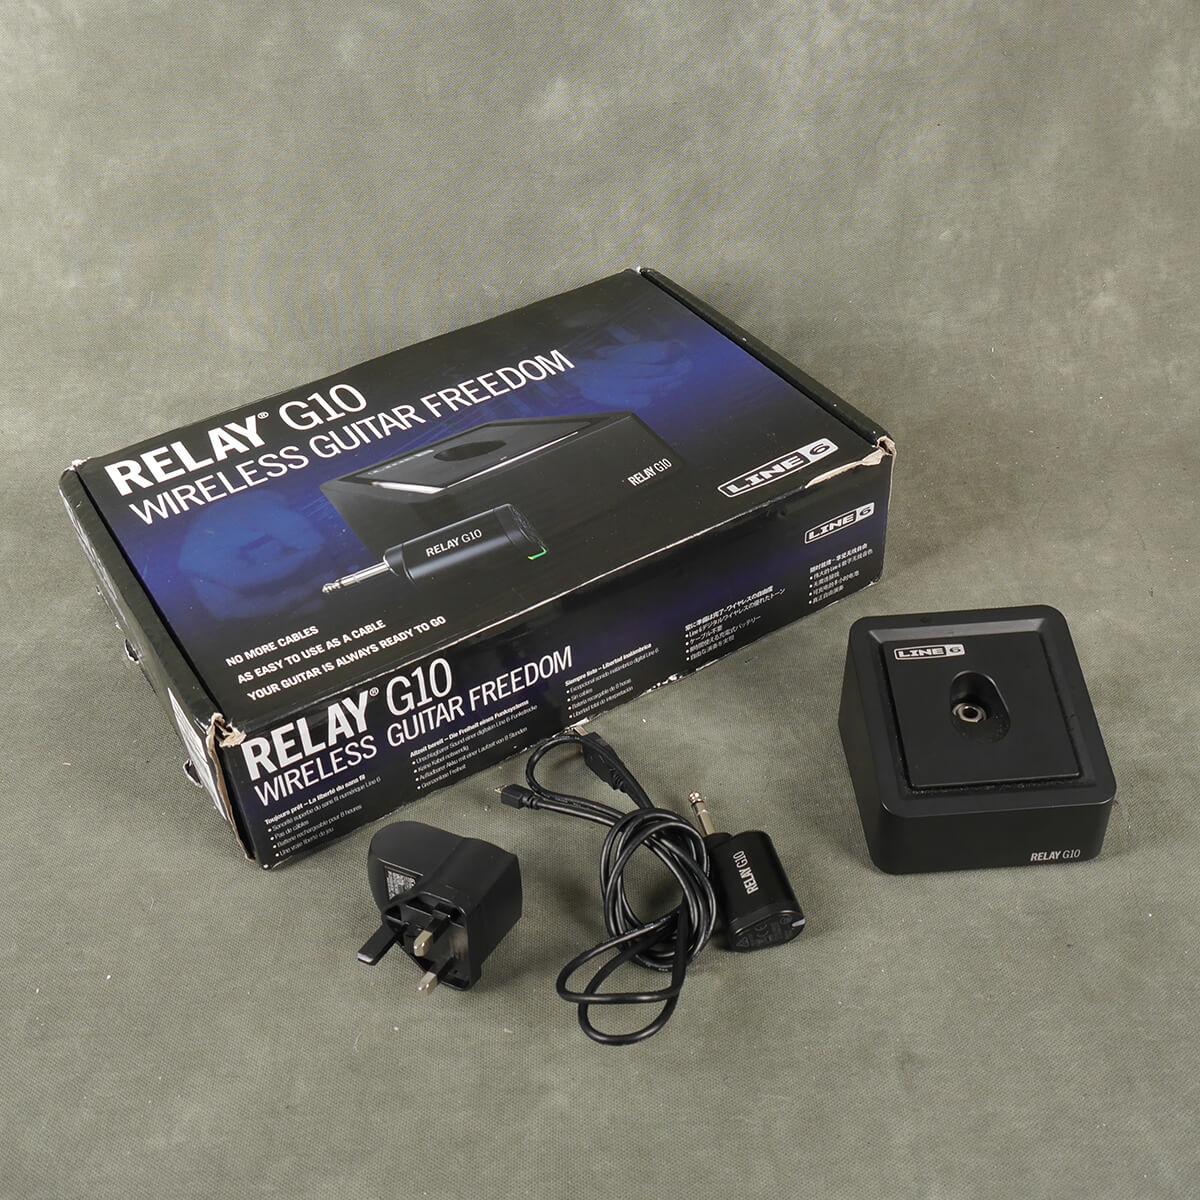 Line 6 Relay G10 Wireless System w/Box - 2nd Hand